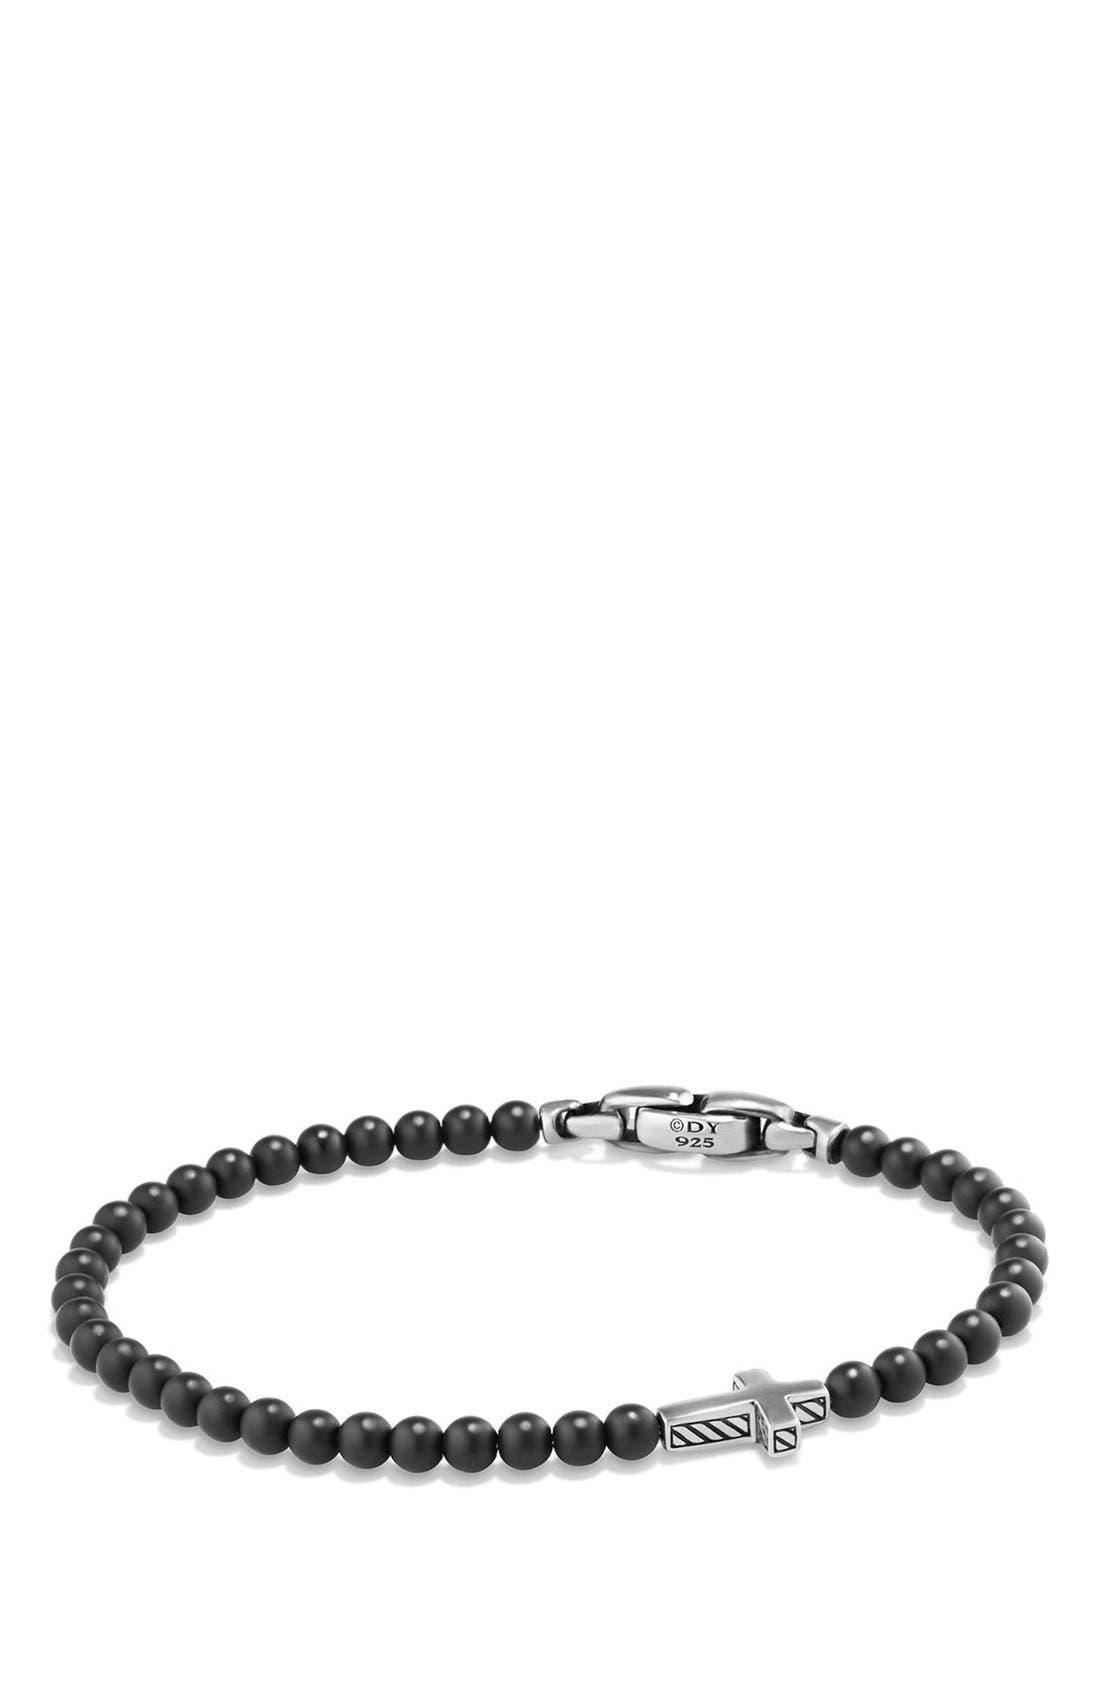 'Spiritual Beads' Cross Bead Bracelet with Semiprecious Stones,                             Main thumbnail 1, color,                             SILVER/ BLACK ONYX